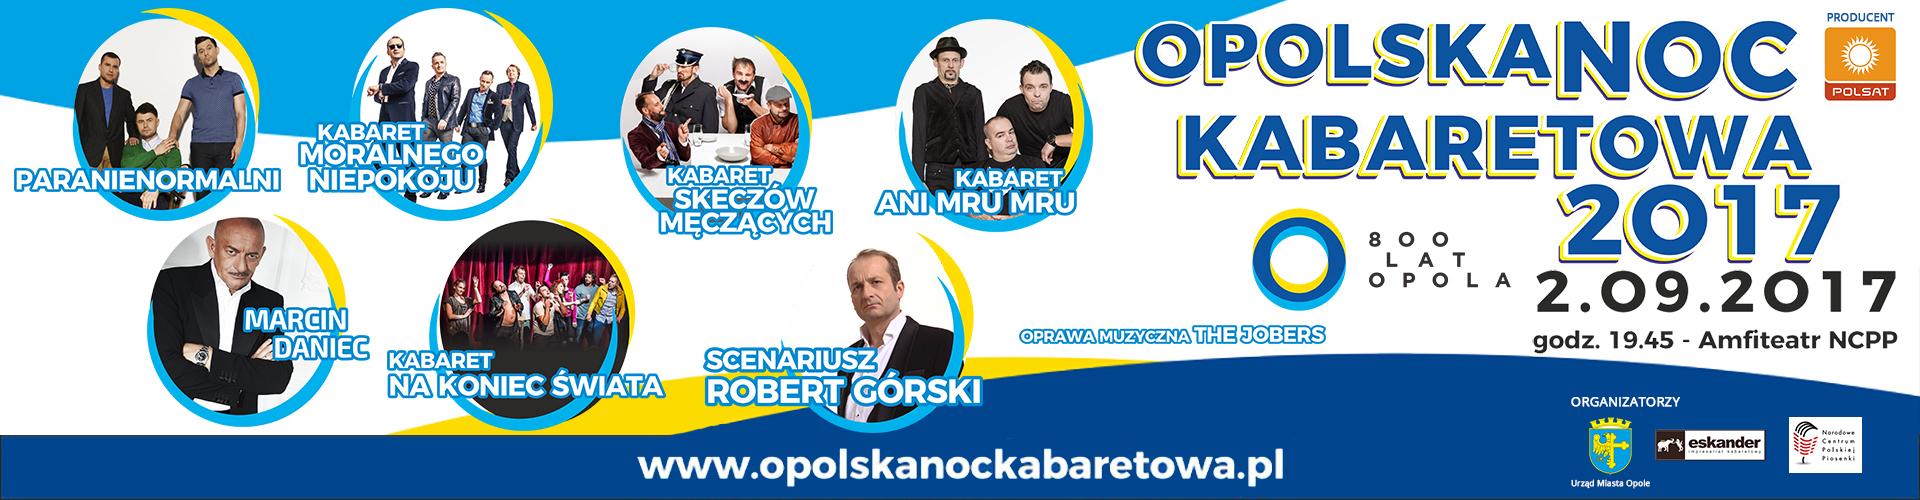 slider_opolskanockabaretowa_1920x500